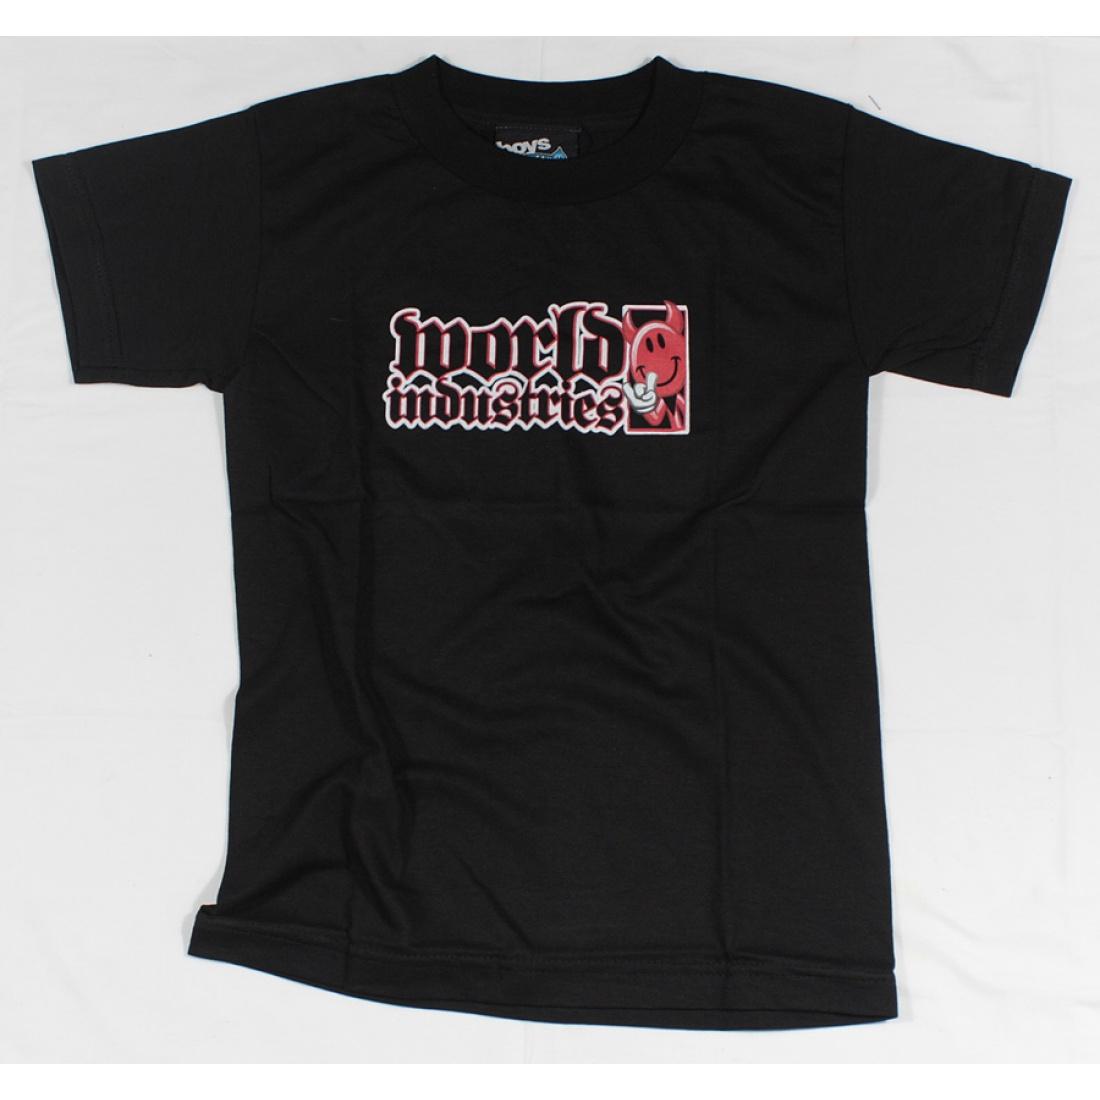 WLD-Devil Classic Boys Black t-shirt Youth Small